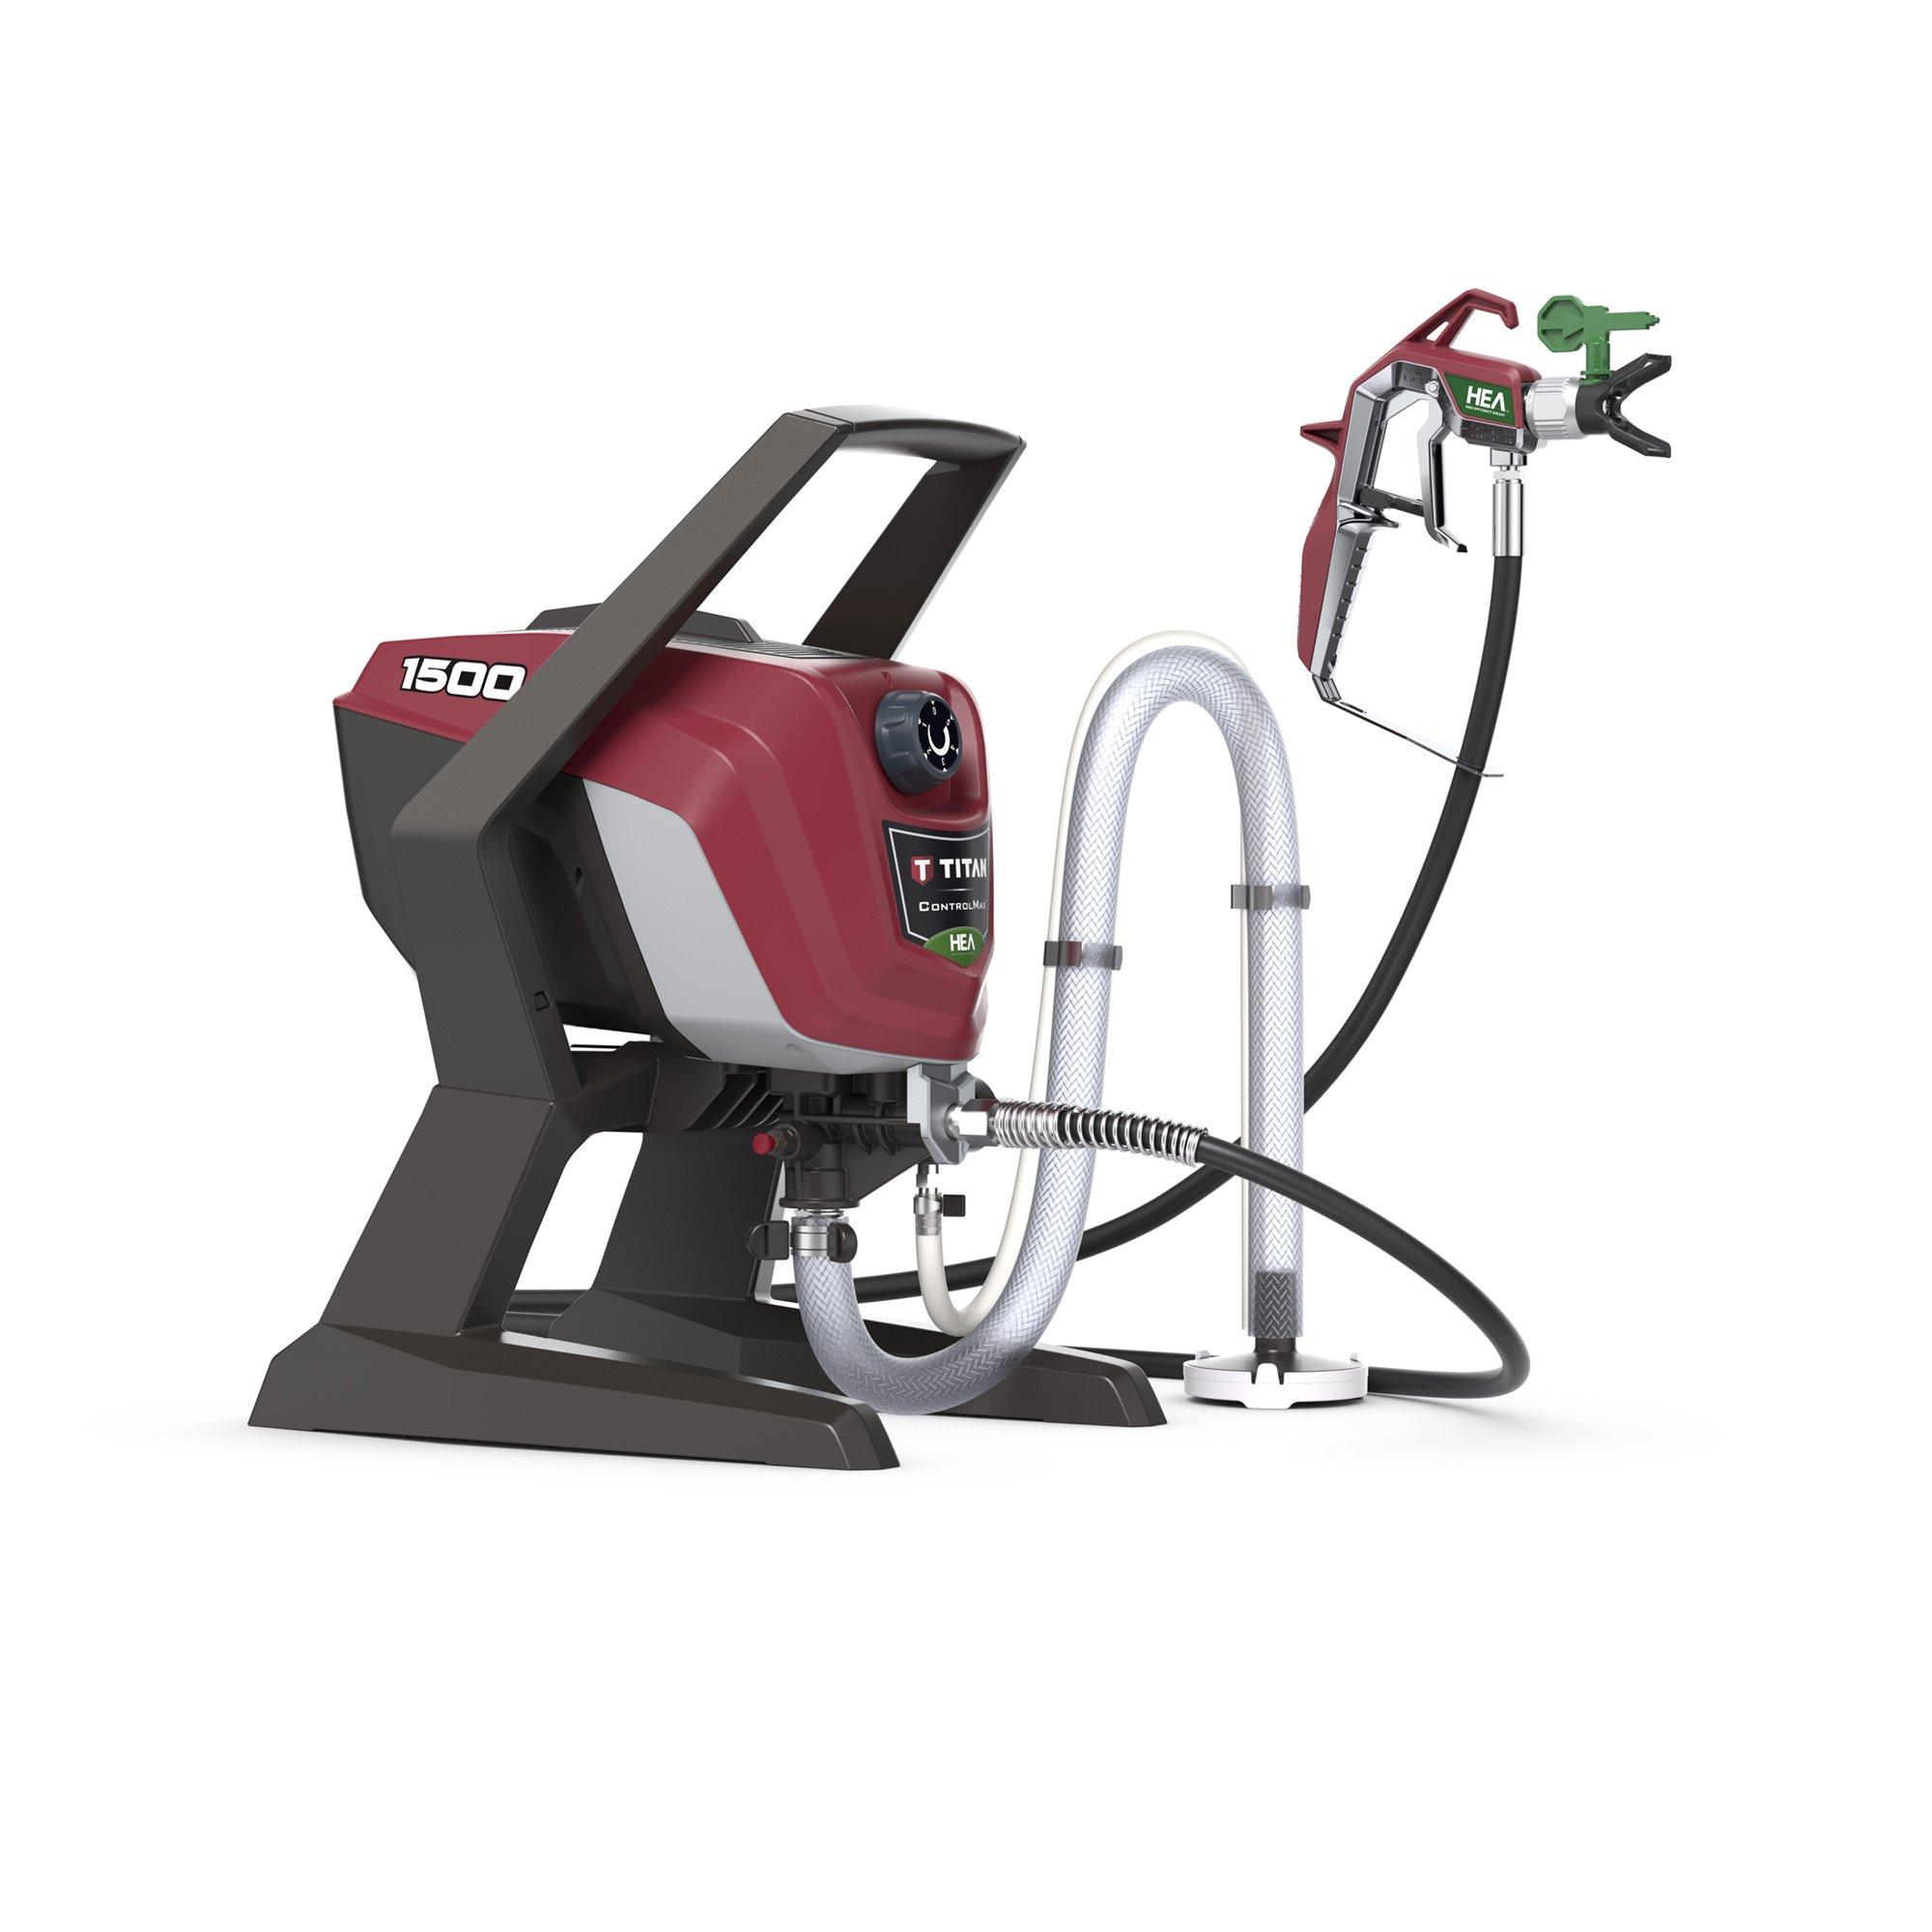 Titan ControlMax 1500 High Efficiency Airless Paint Sprayer by Titan Tool